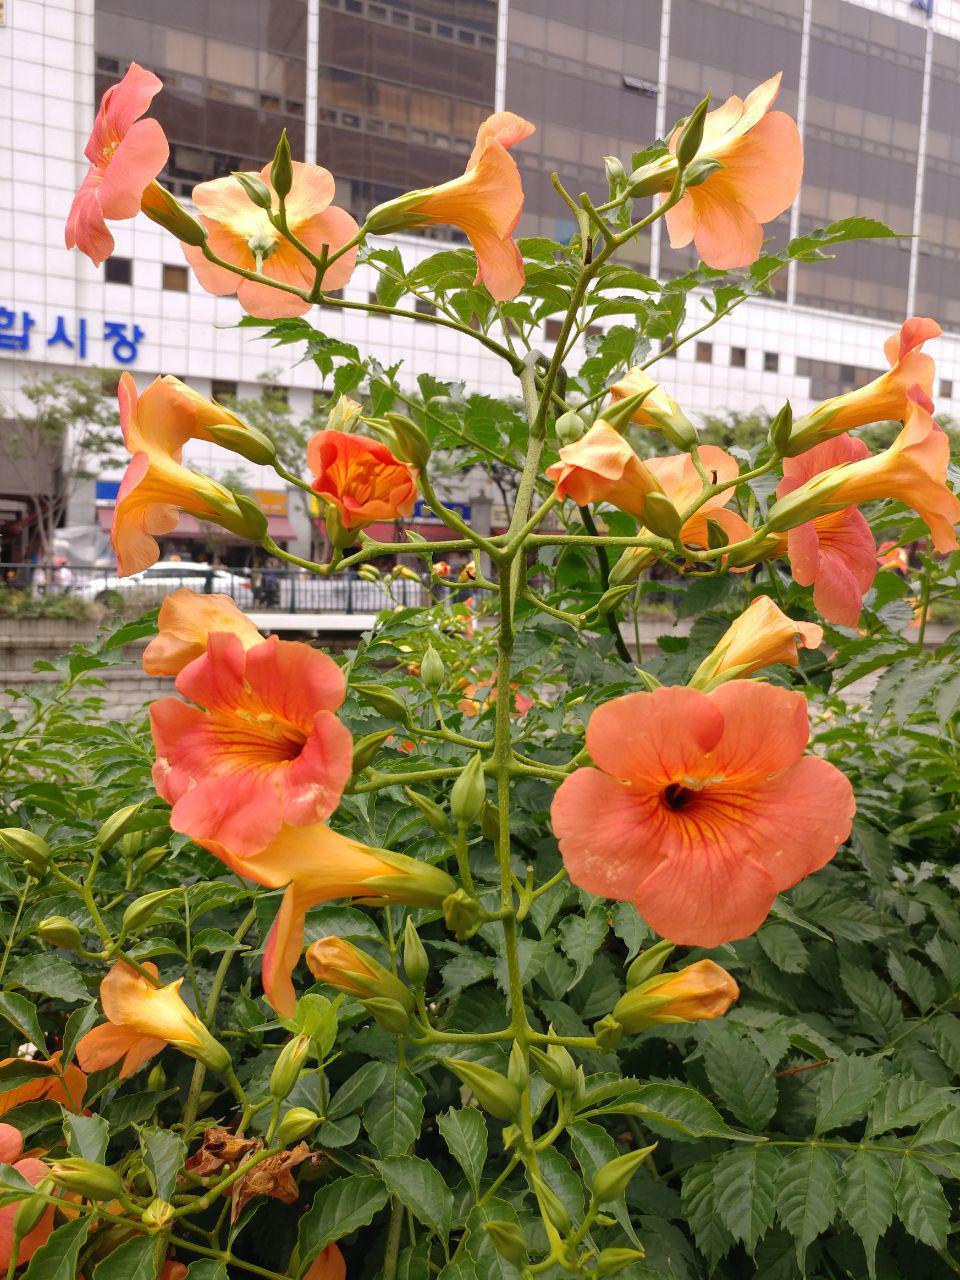 photo_2018-06-30_16-35-02.jpg